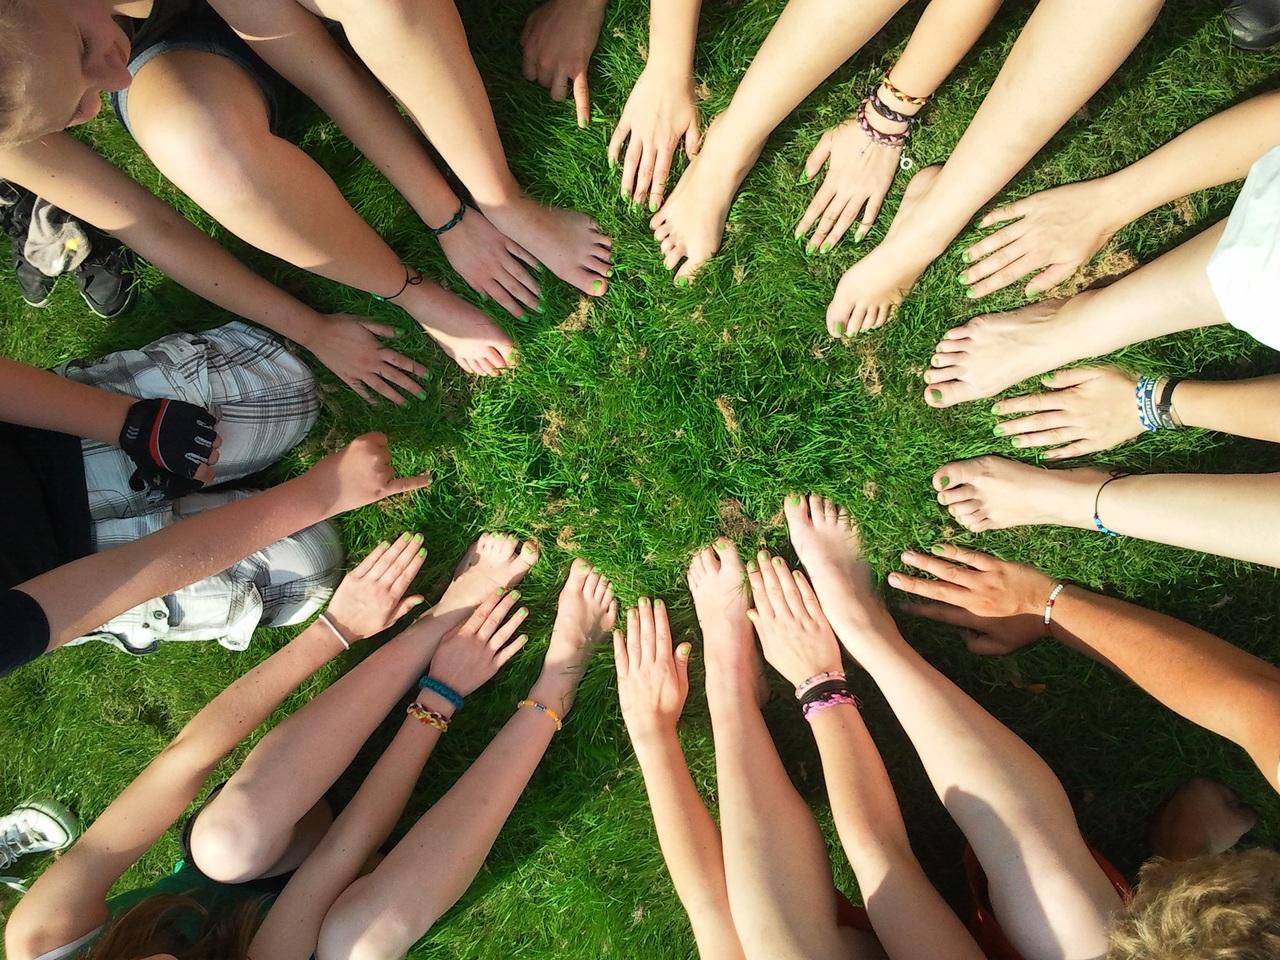 hand-tree-grass-group-people-plant-954284-pxhere.com.jpg